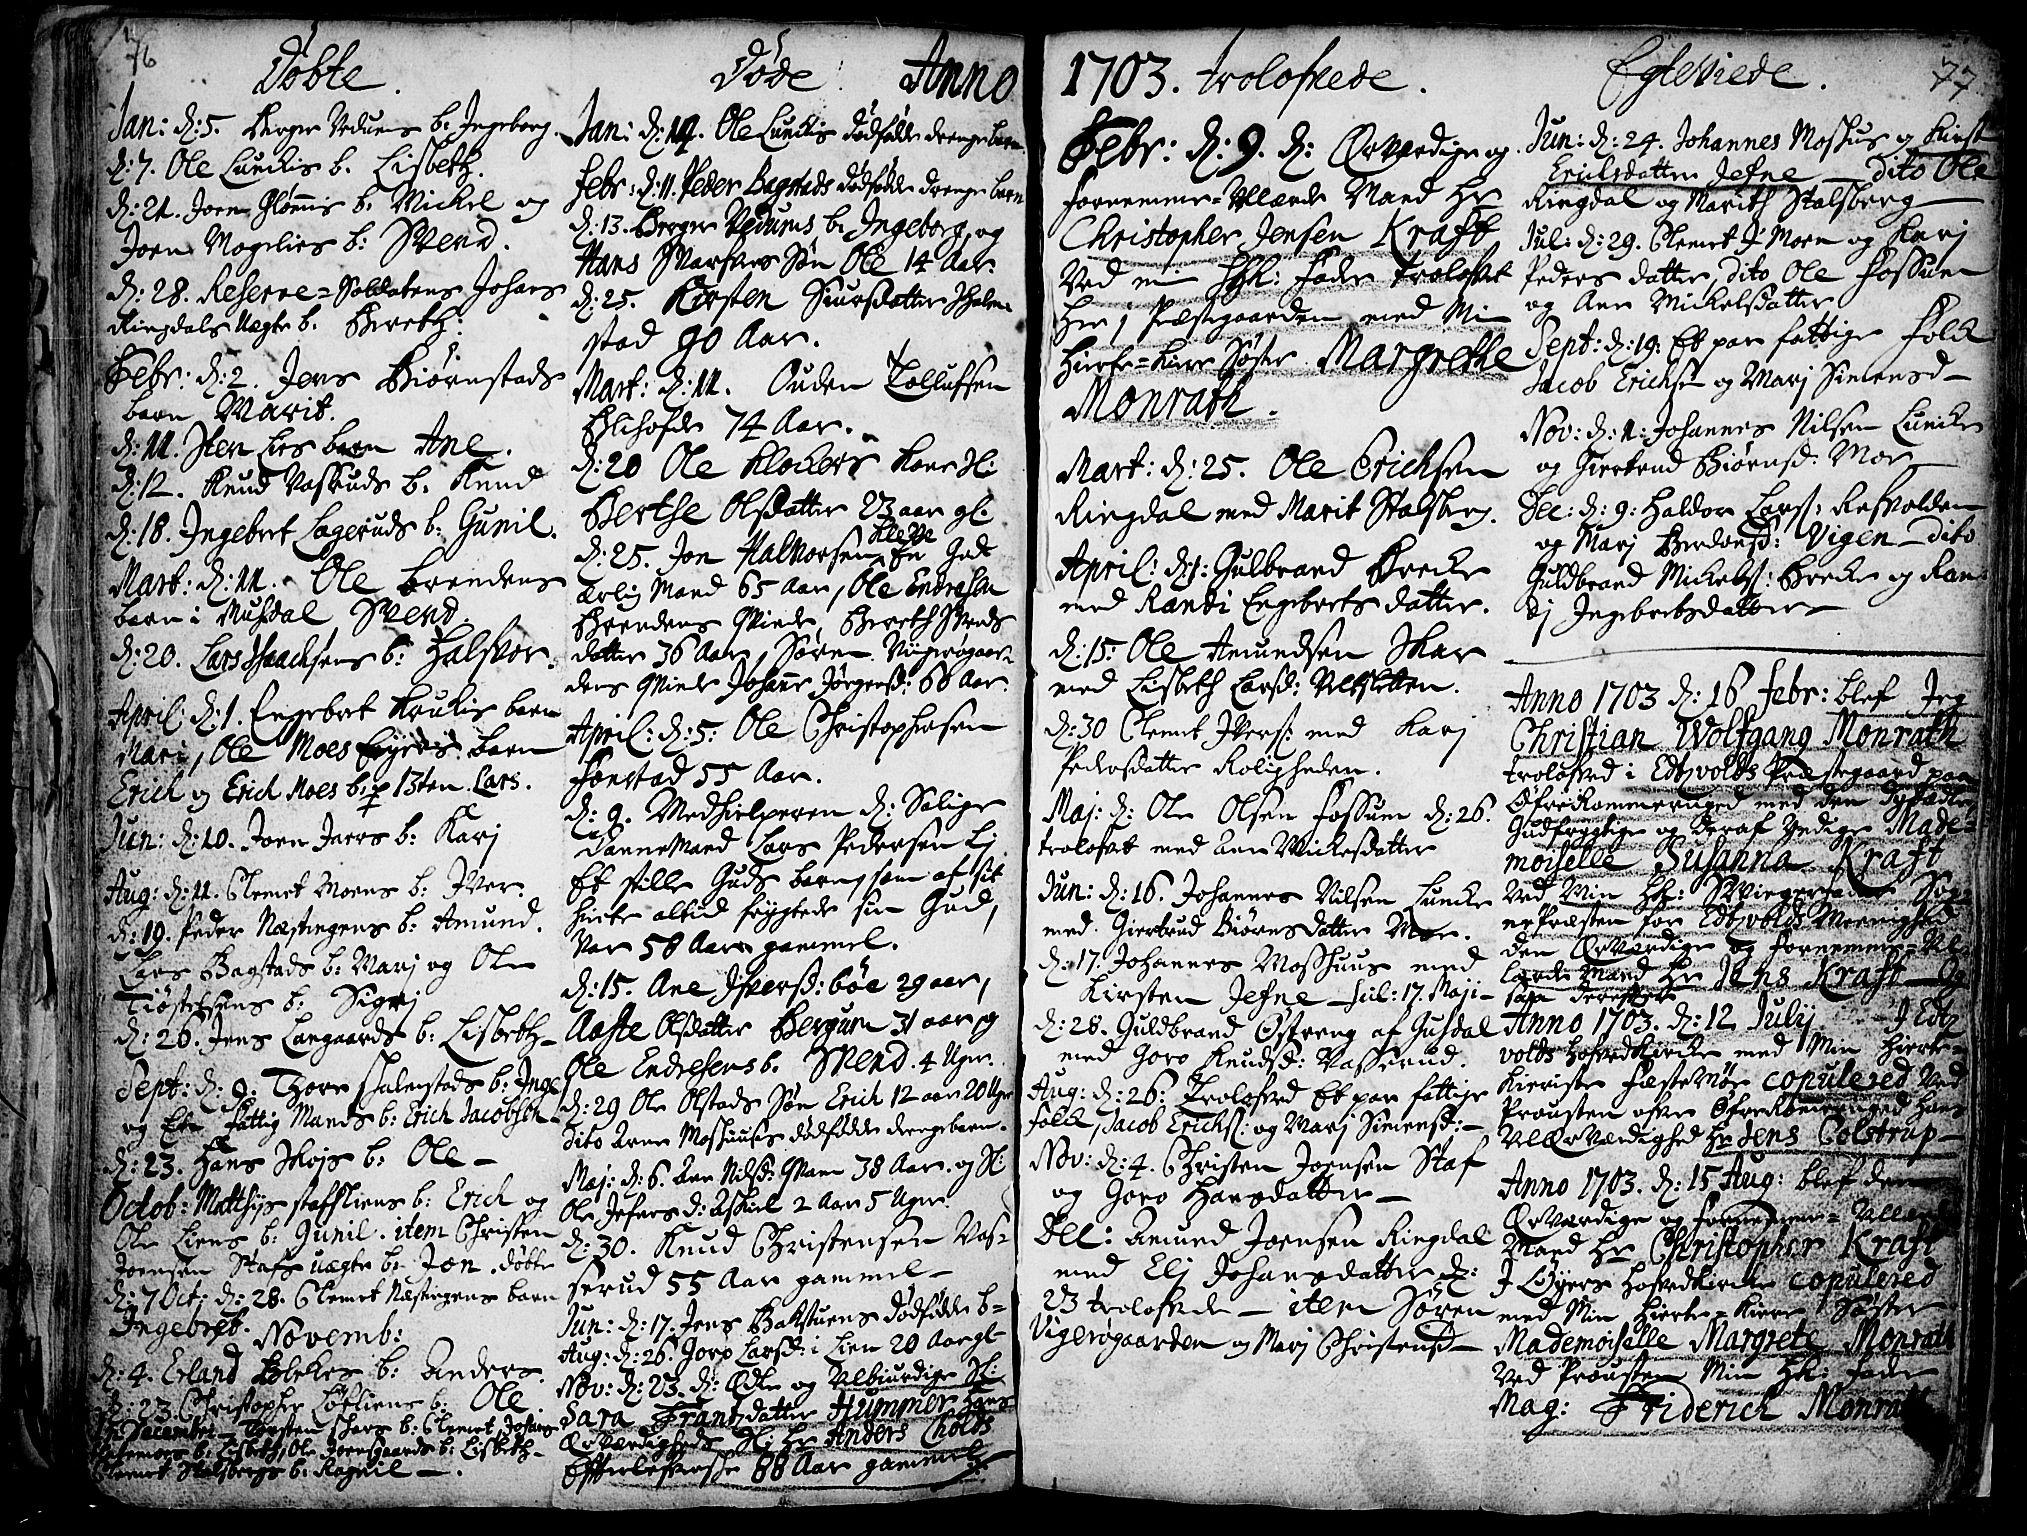 SAH, Øyer prestekontor, Ministerialbok nr. 1, 1671-1727, s. 76-77